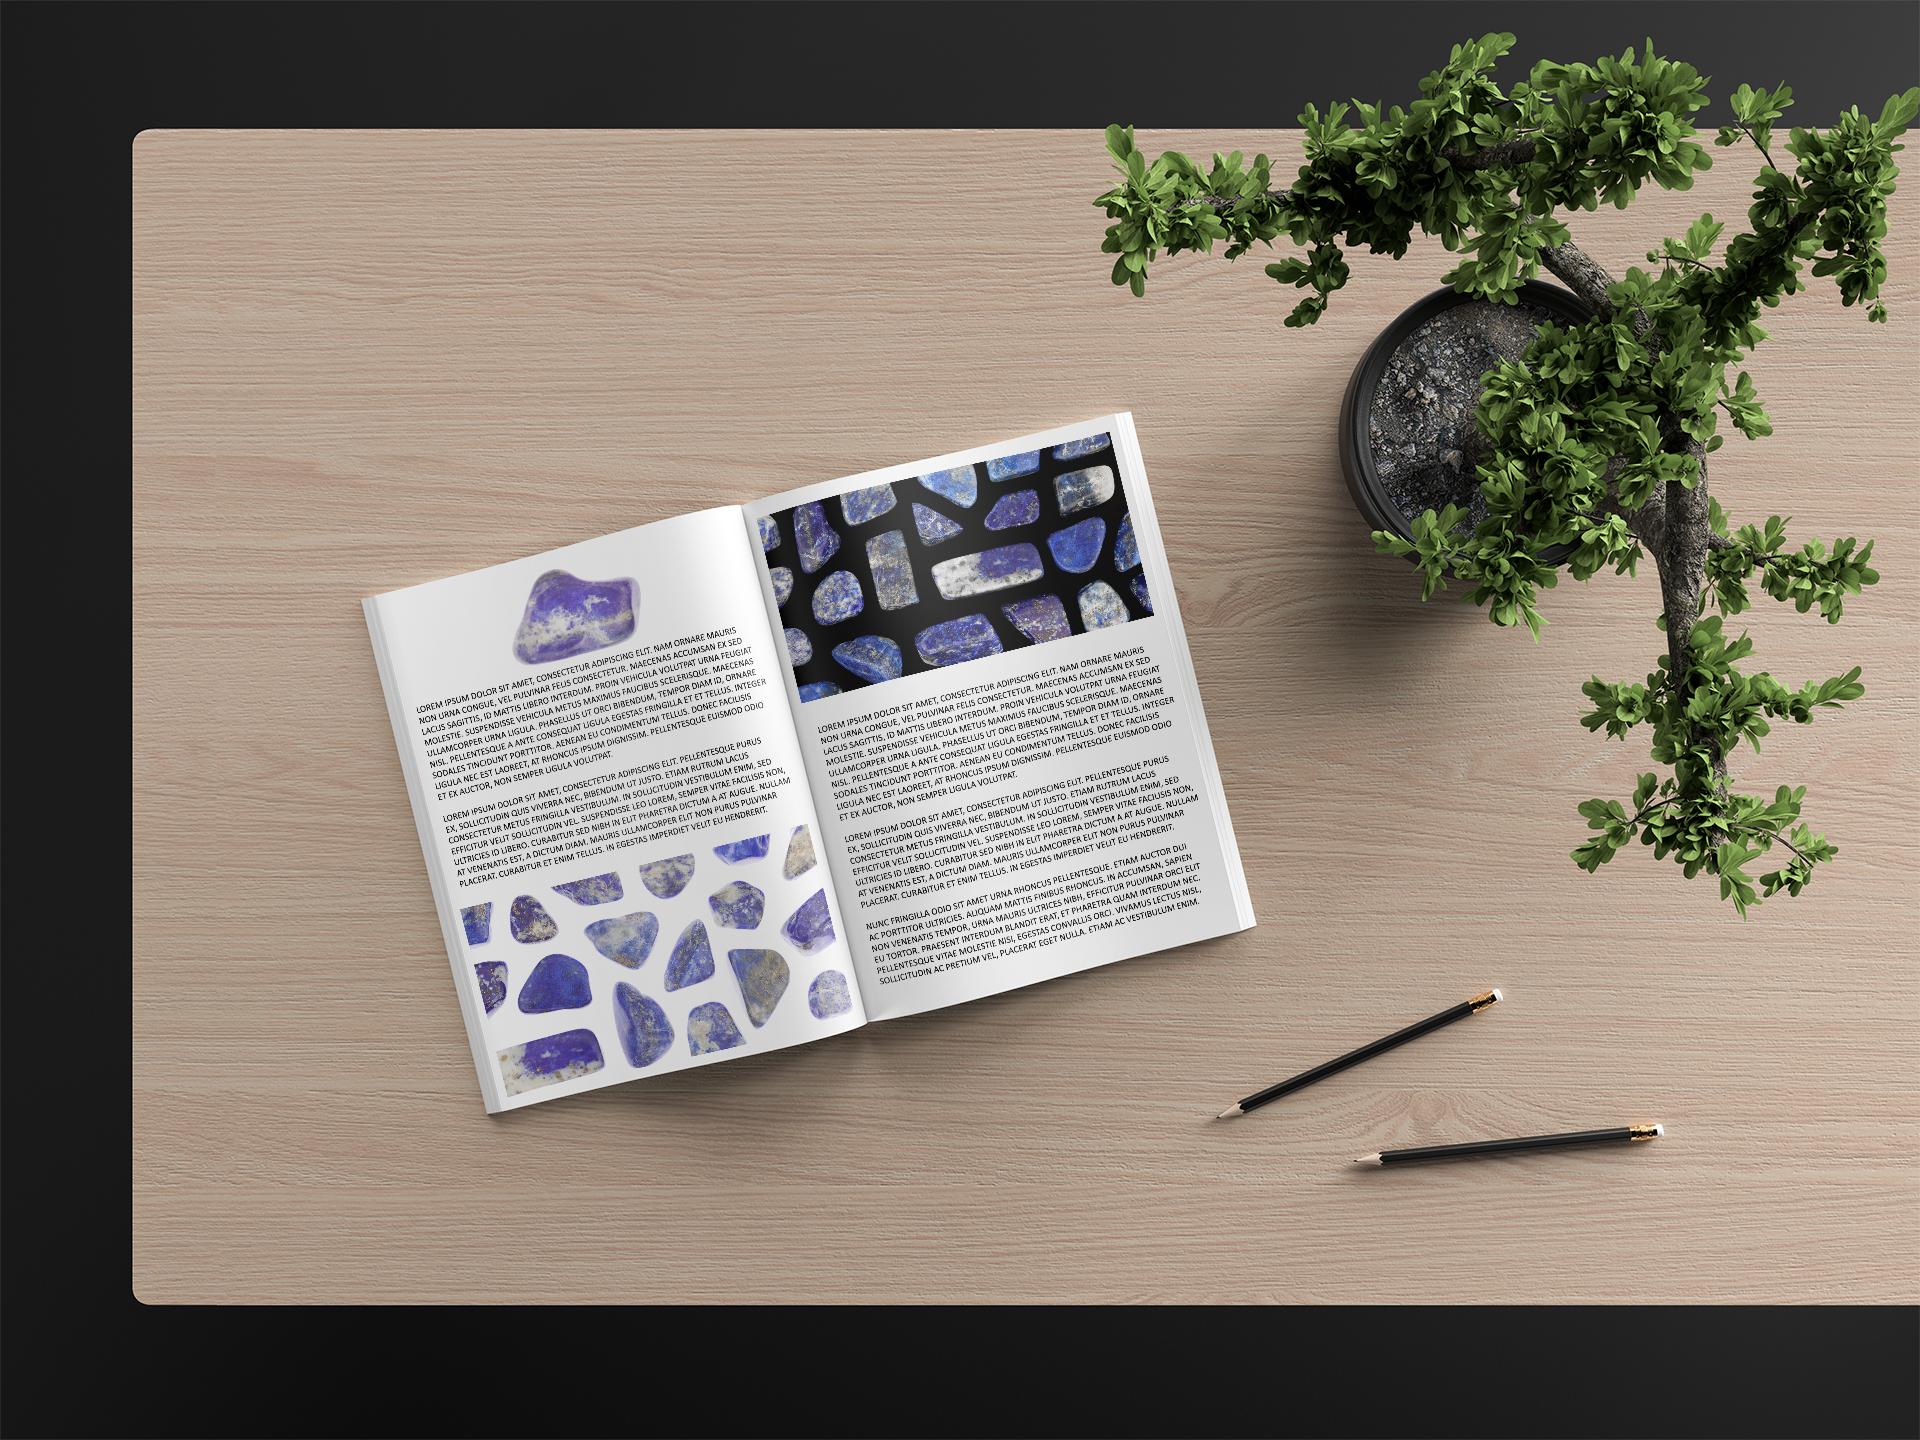 Lapis Lazuli Background Textures Modern Magazine Article Illustrations Preview